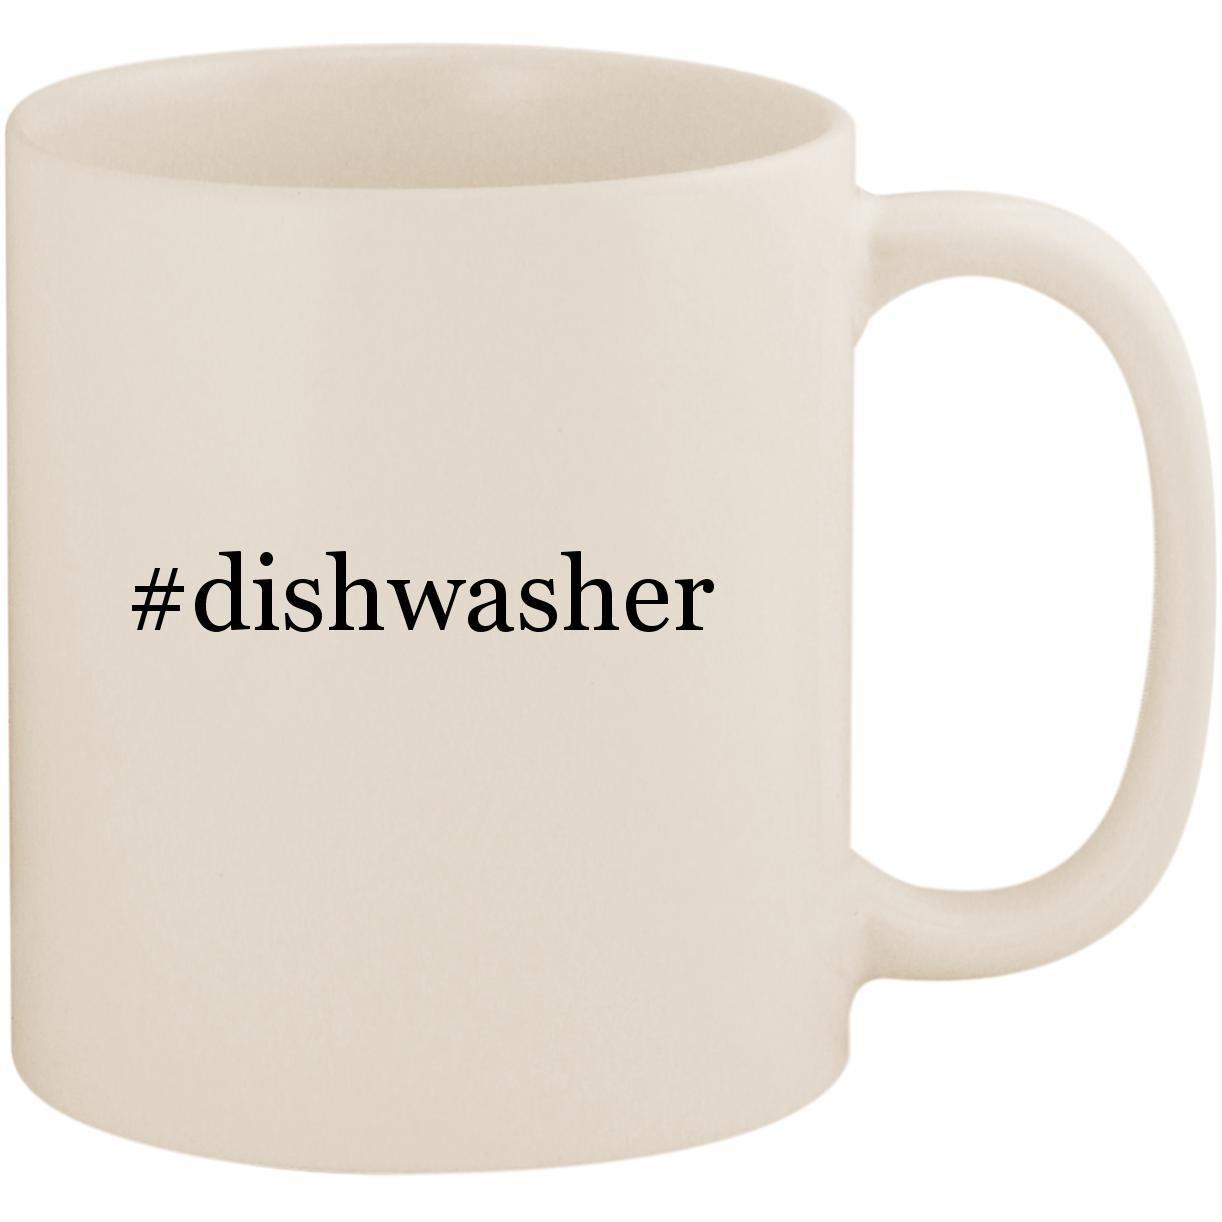 #dishwasher - 11oz Ceramic Coffee Mug Cup, White